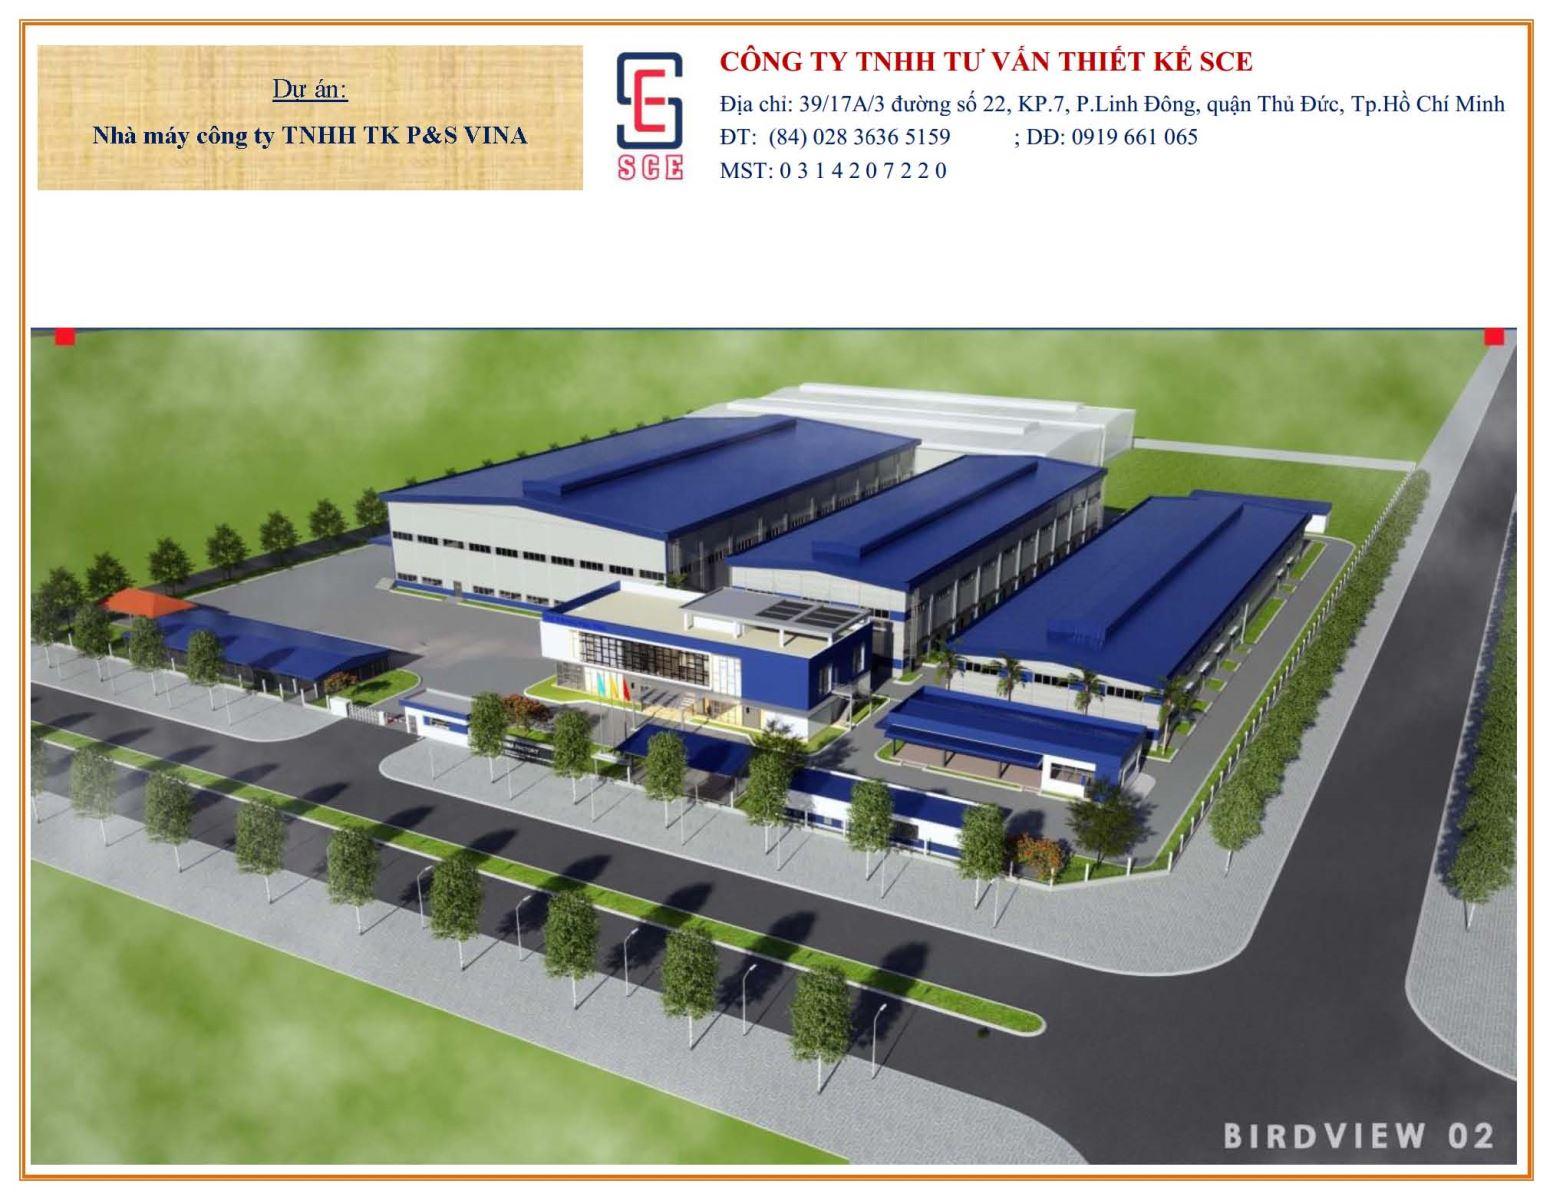 Factory of P & S VINA